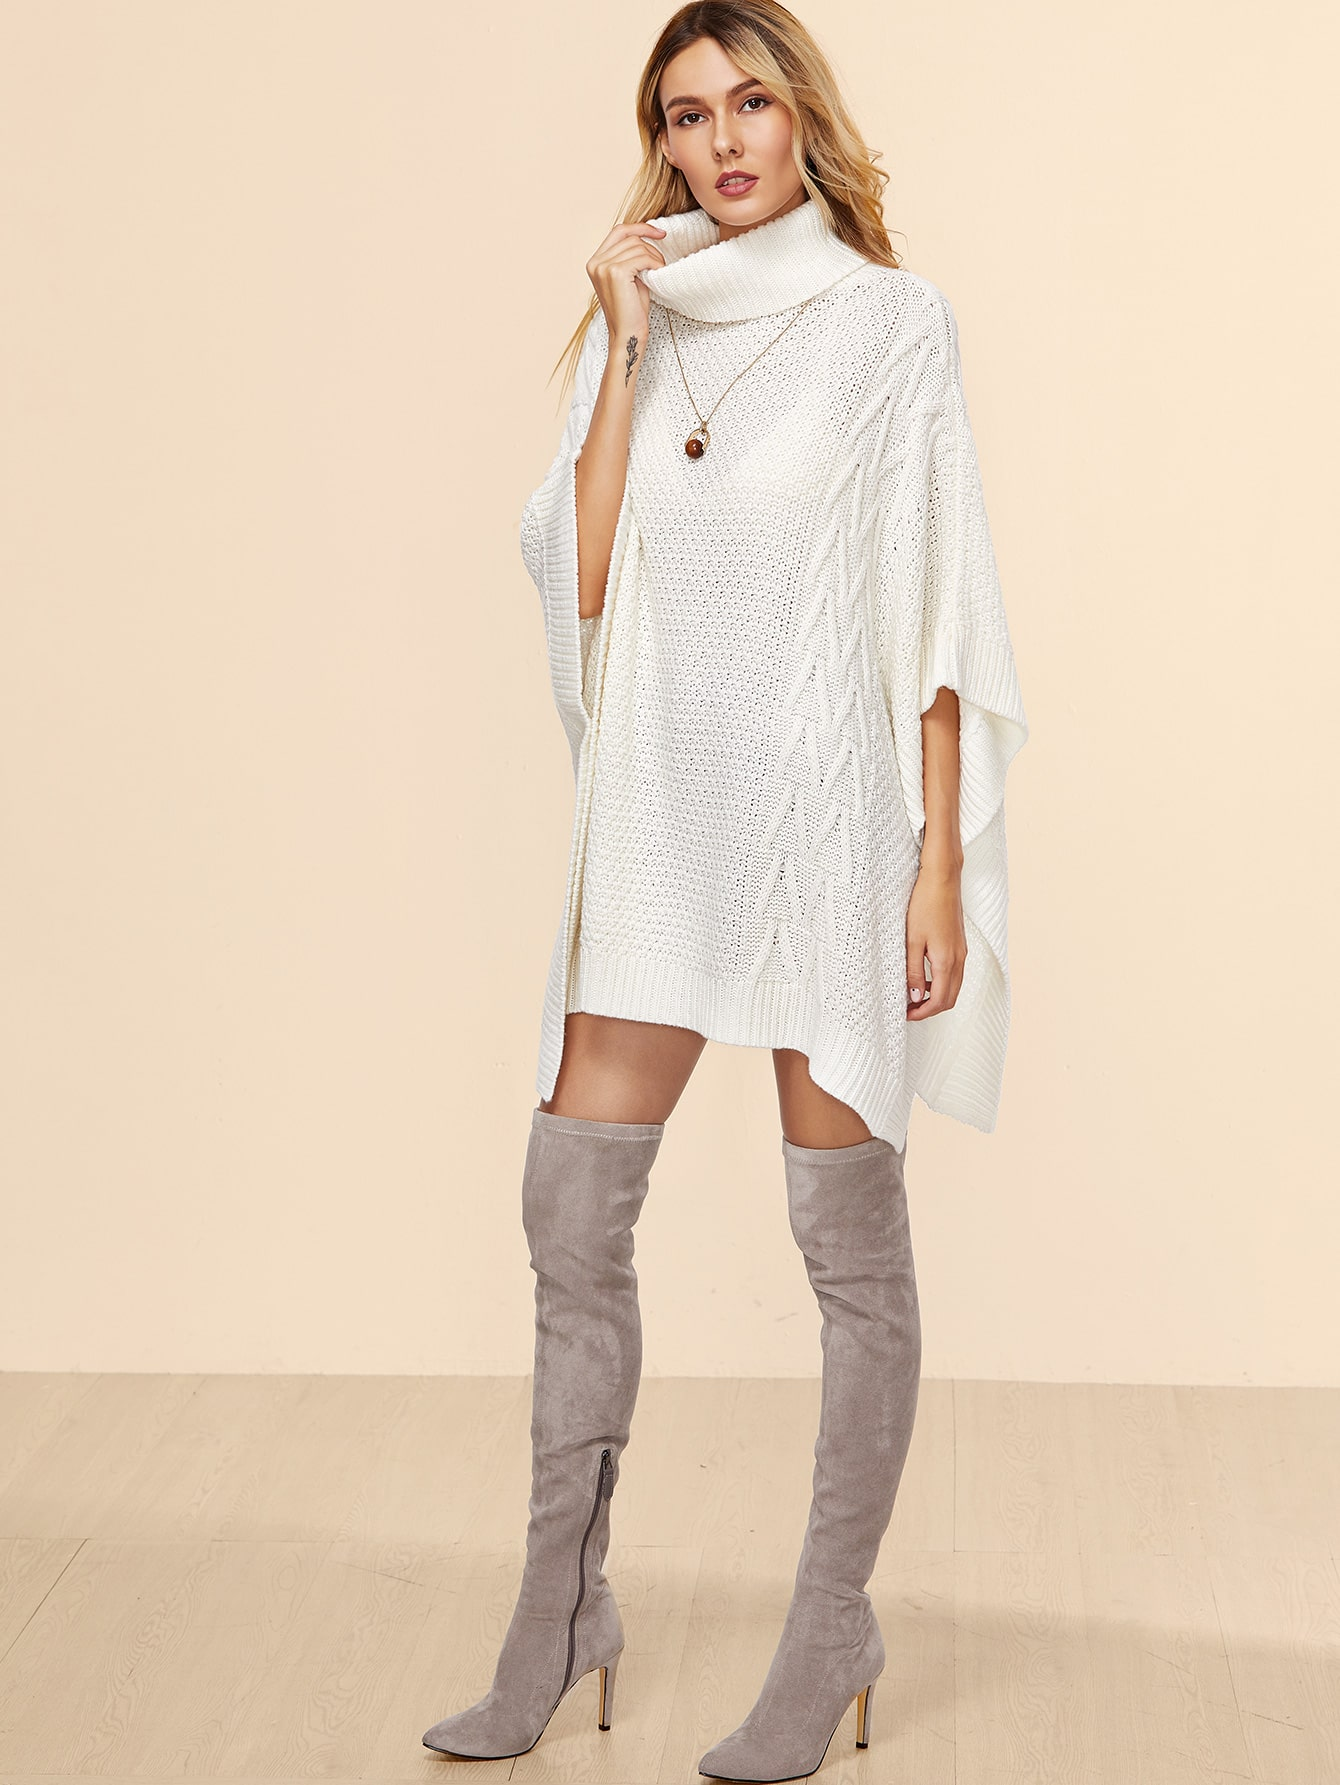 sweater161103404_2